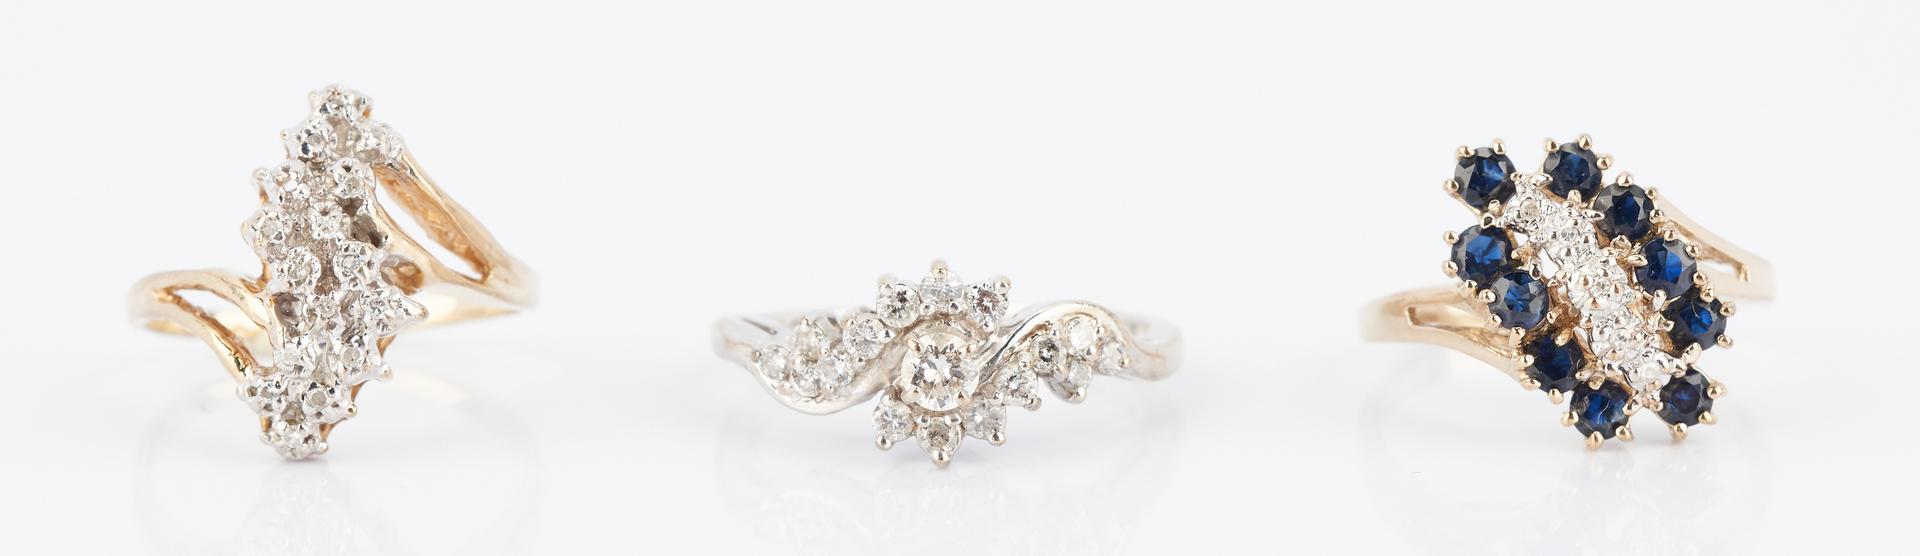 Lot 911: 3 Ladies Yellow & White Gold Diamond Rings